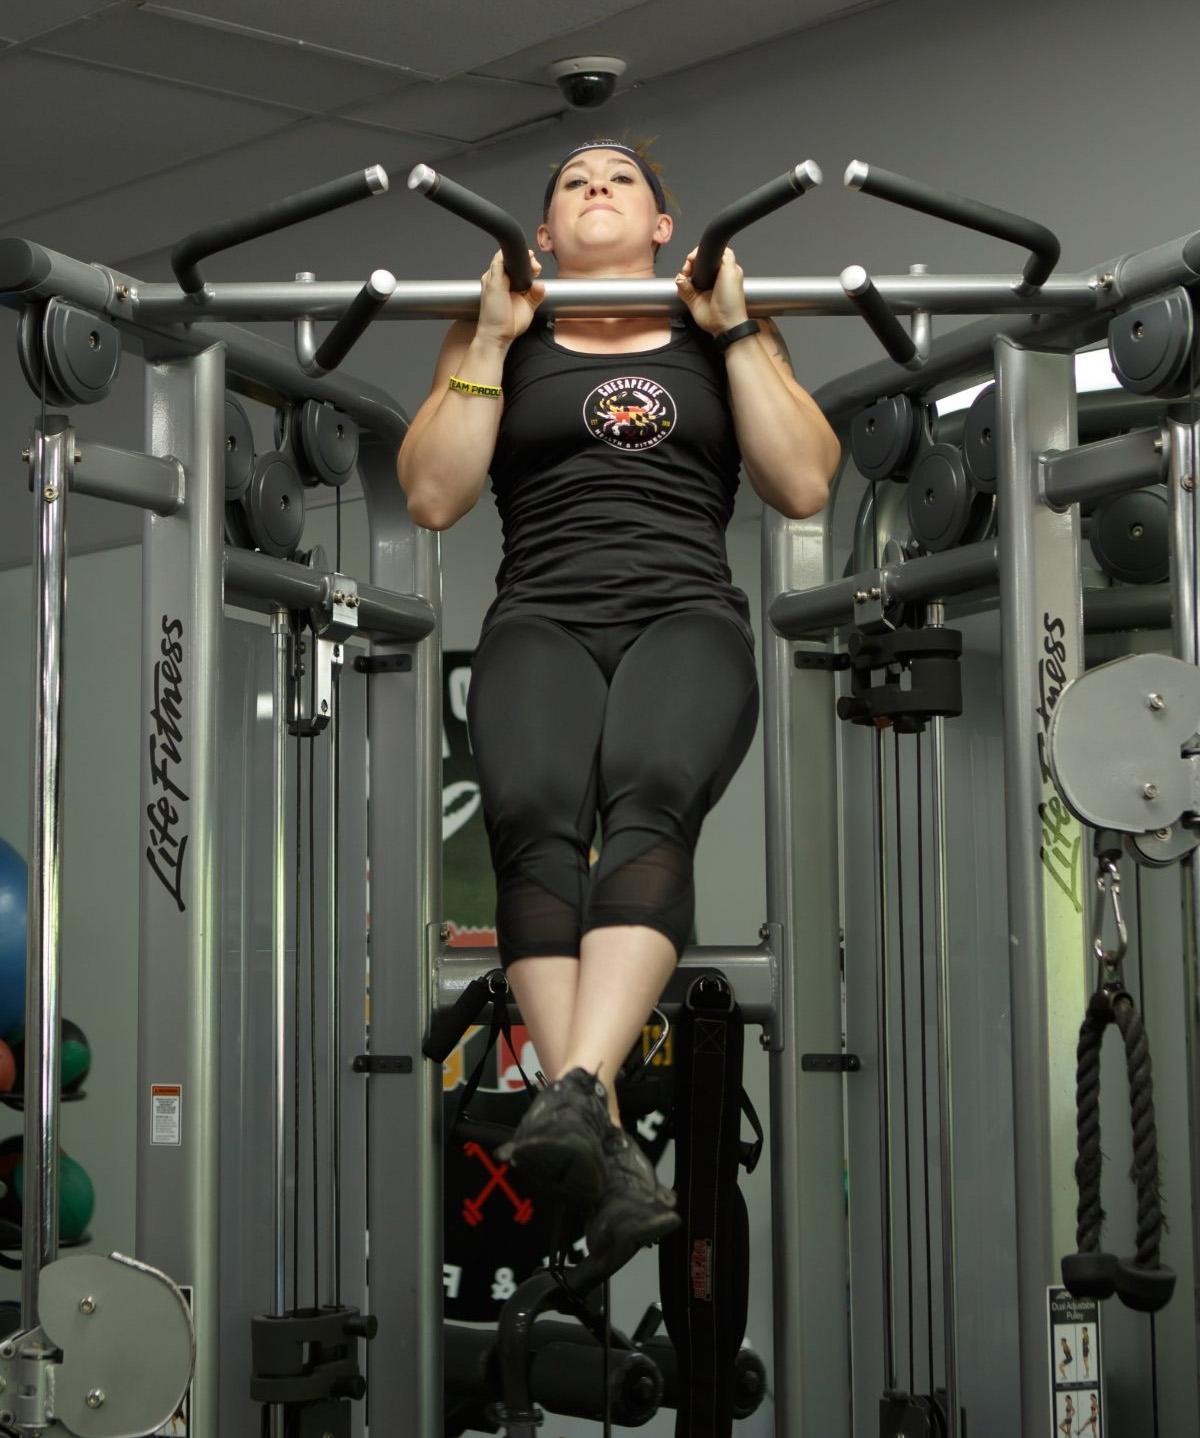 Chesapeake Health and Fitness Club